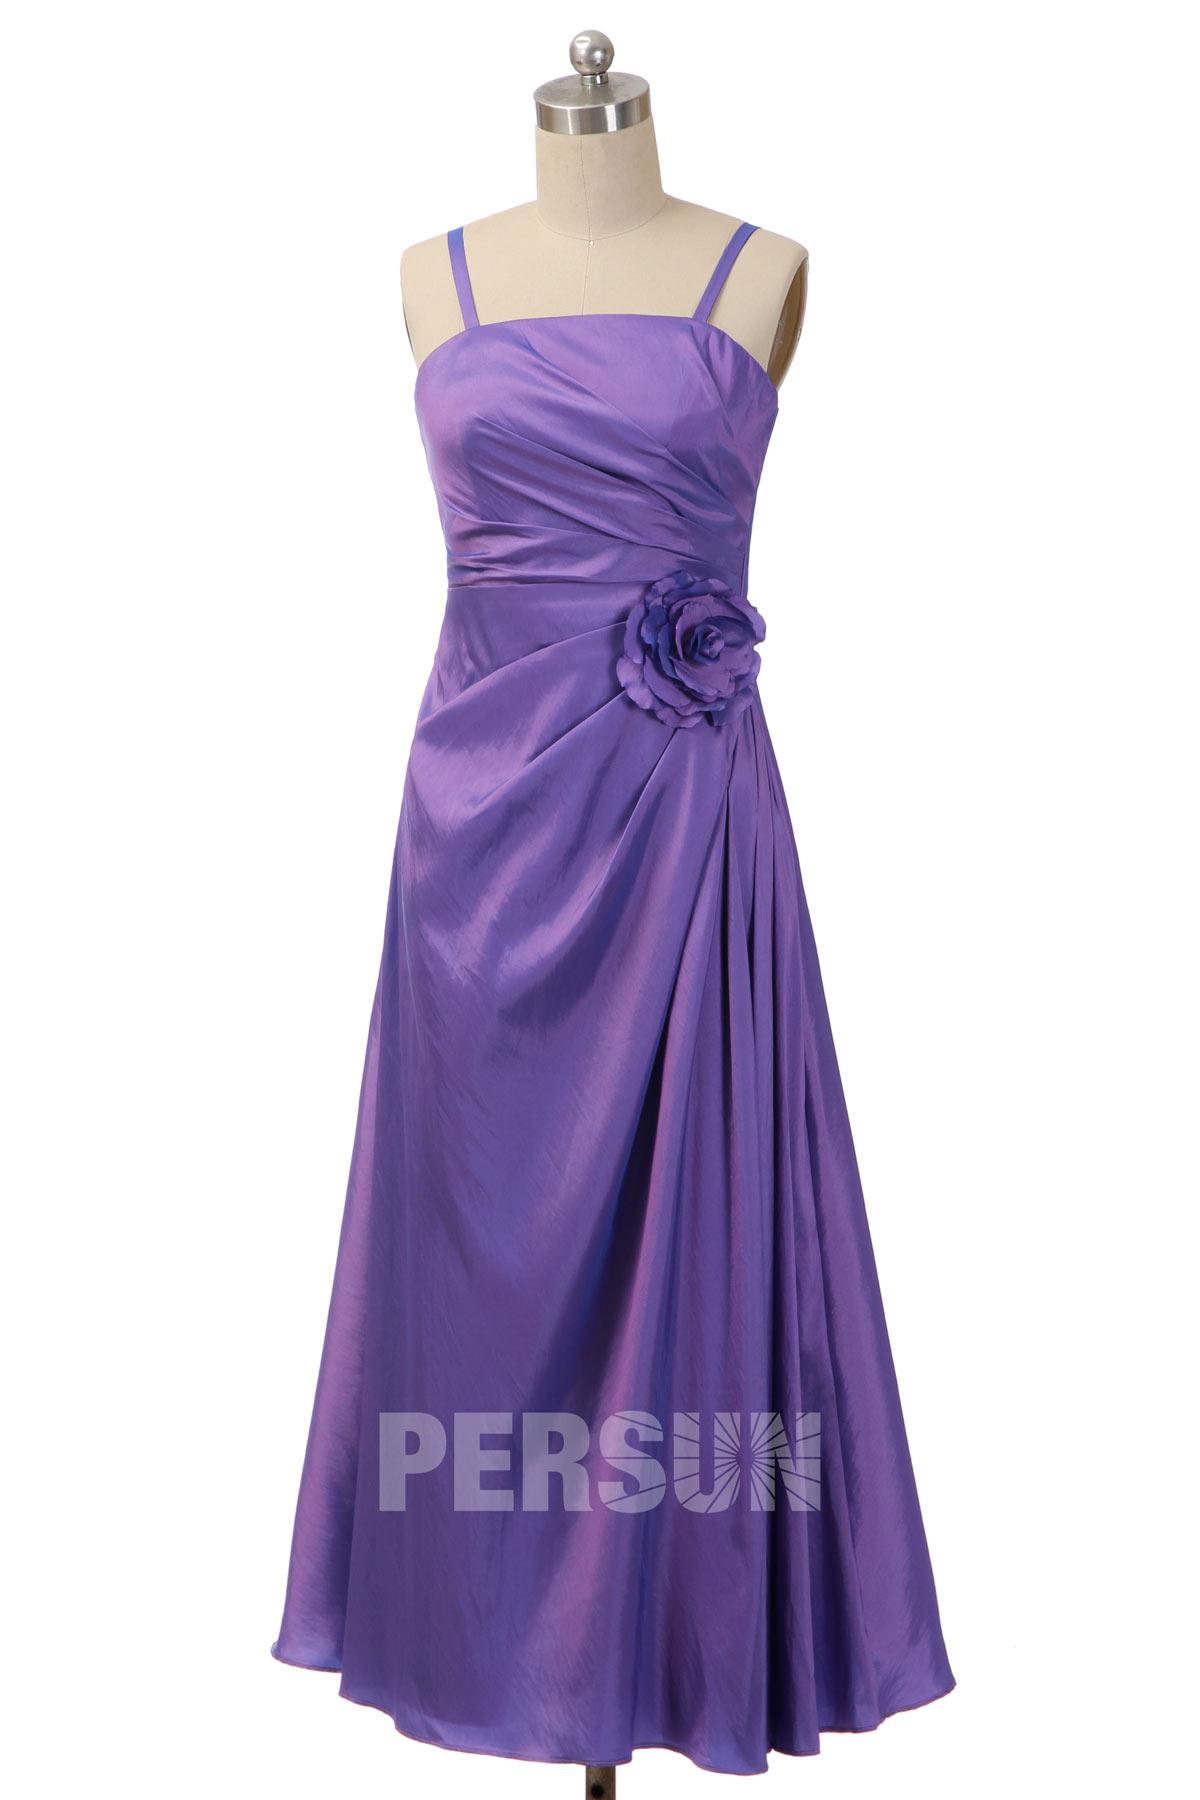 robe cortège fille violette simple taille de fleur avec bretelles spaghetti